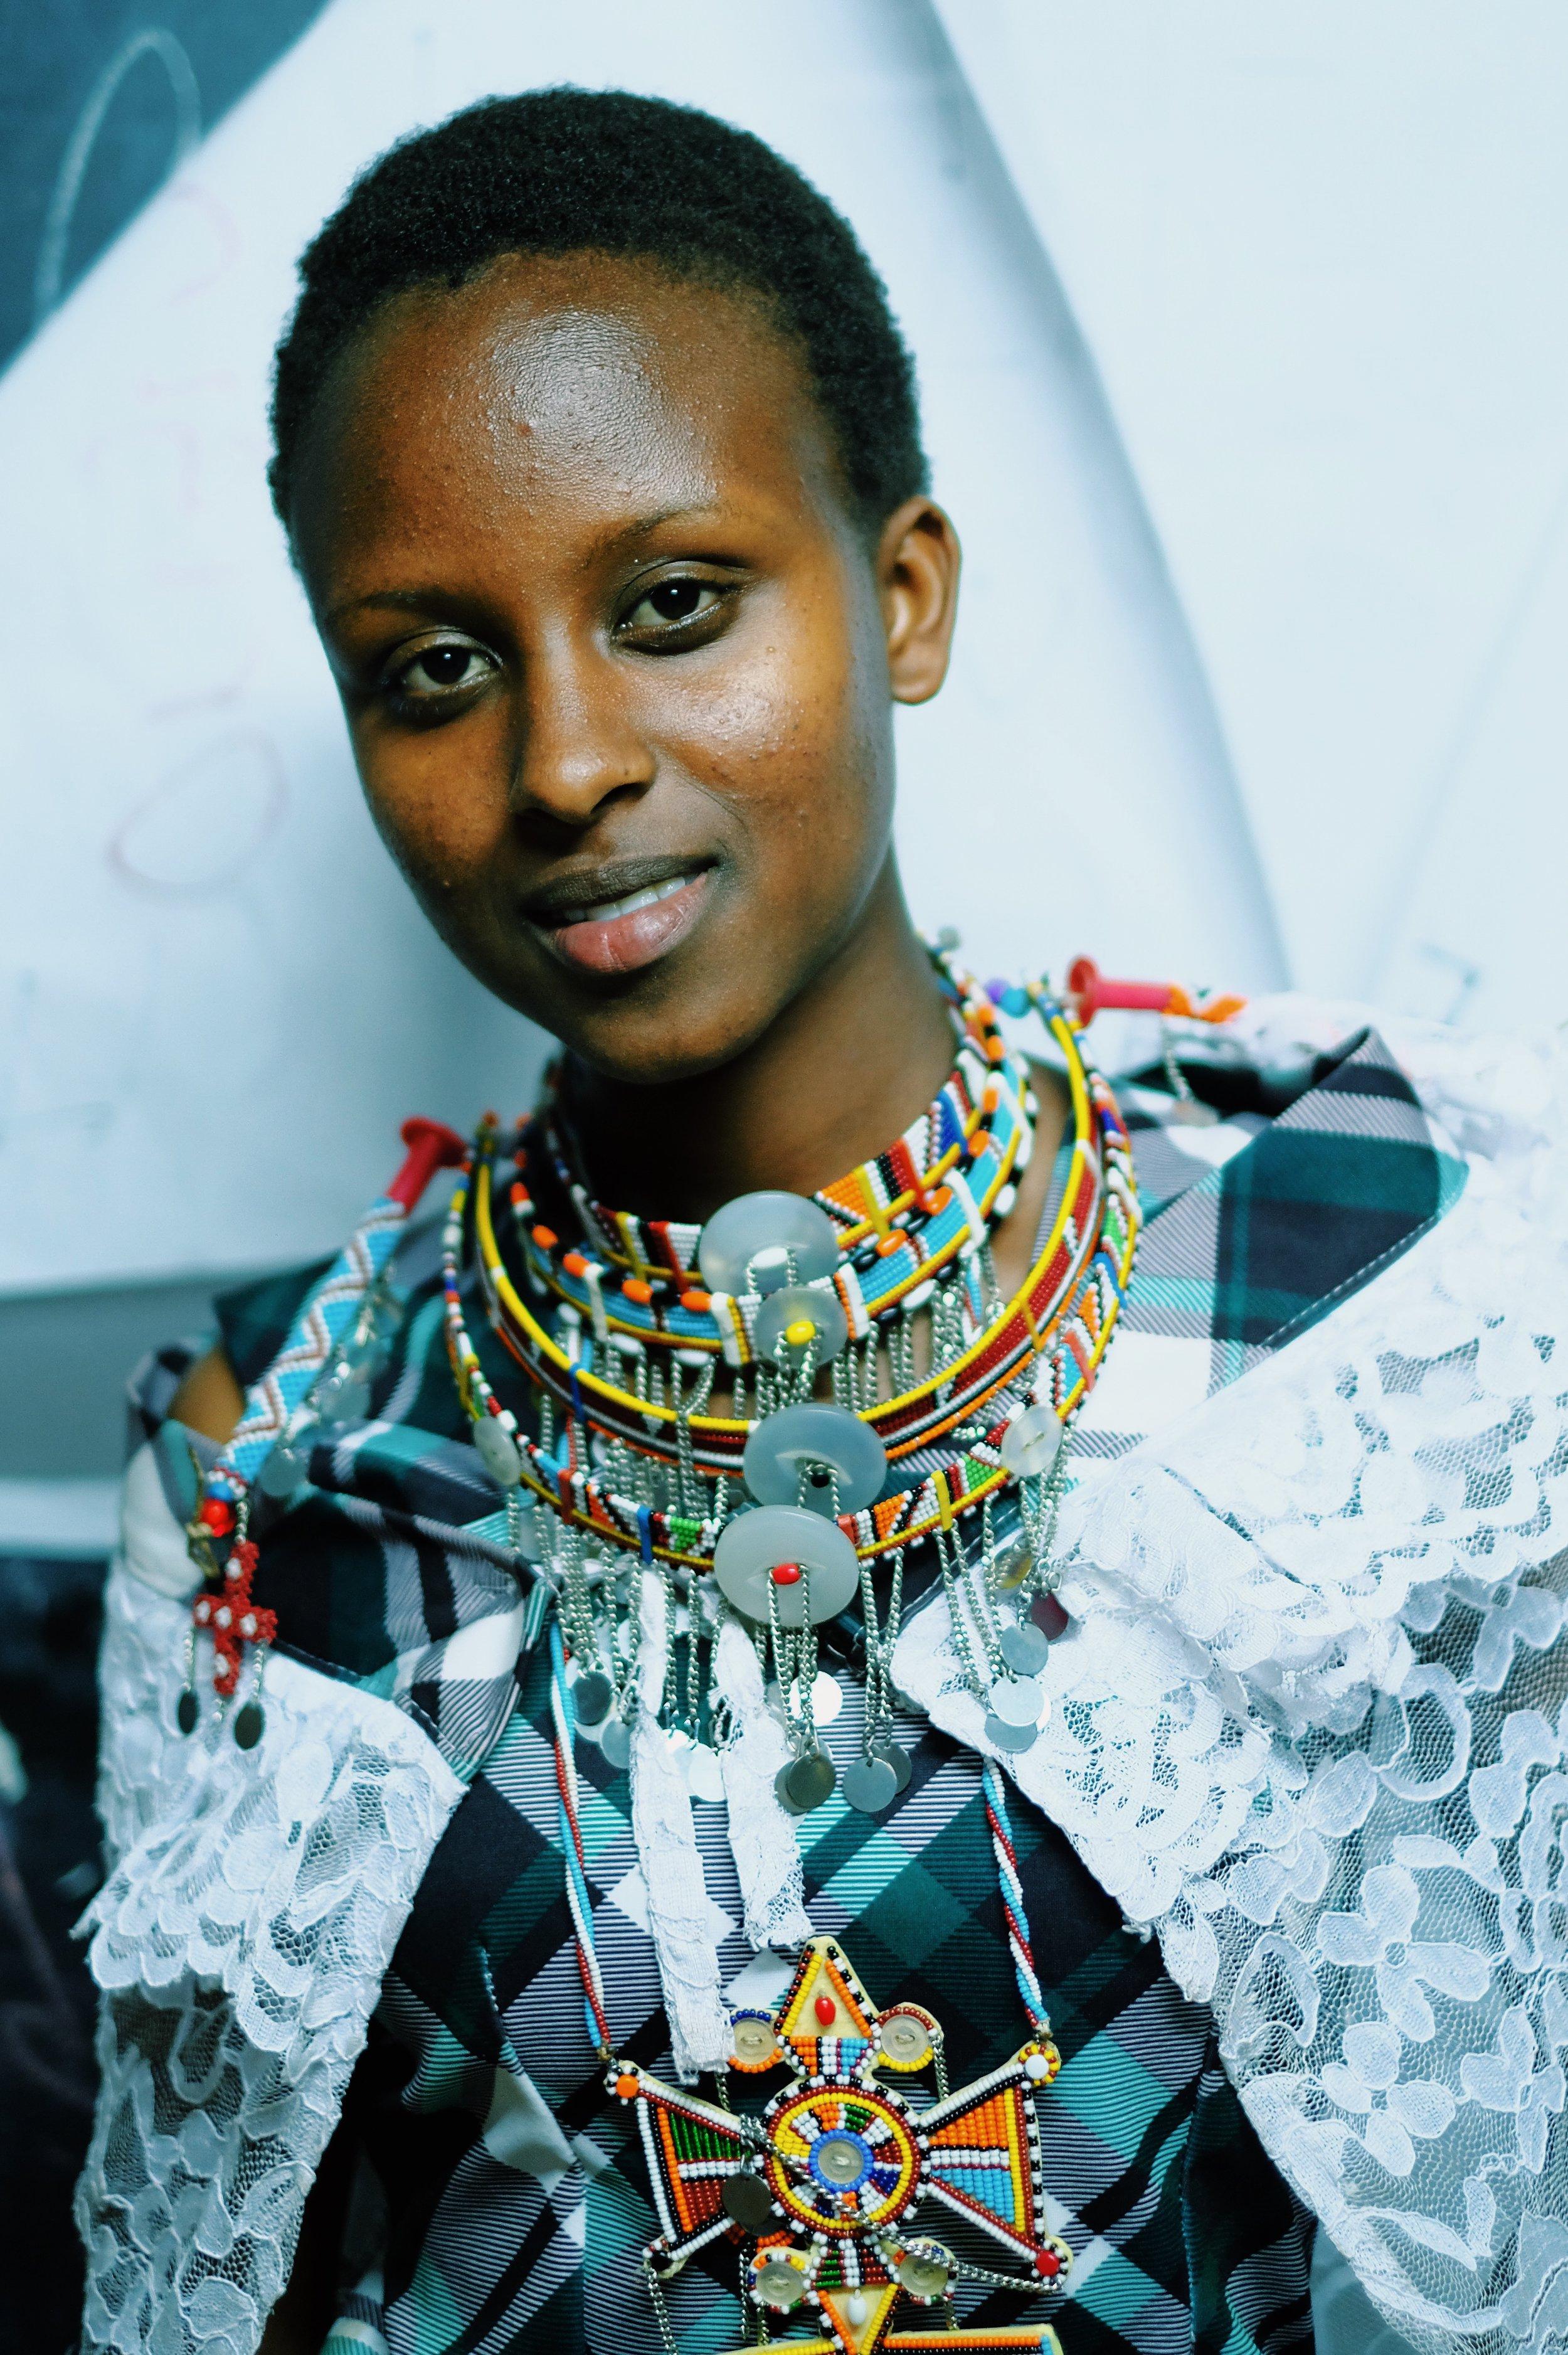 Maasai Olentoko 'End FGM' Beauty Pageant 2 by Joost Bastmeijer.jpeg